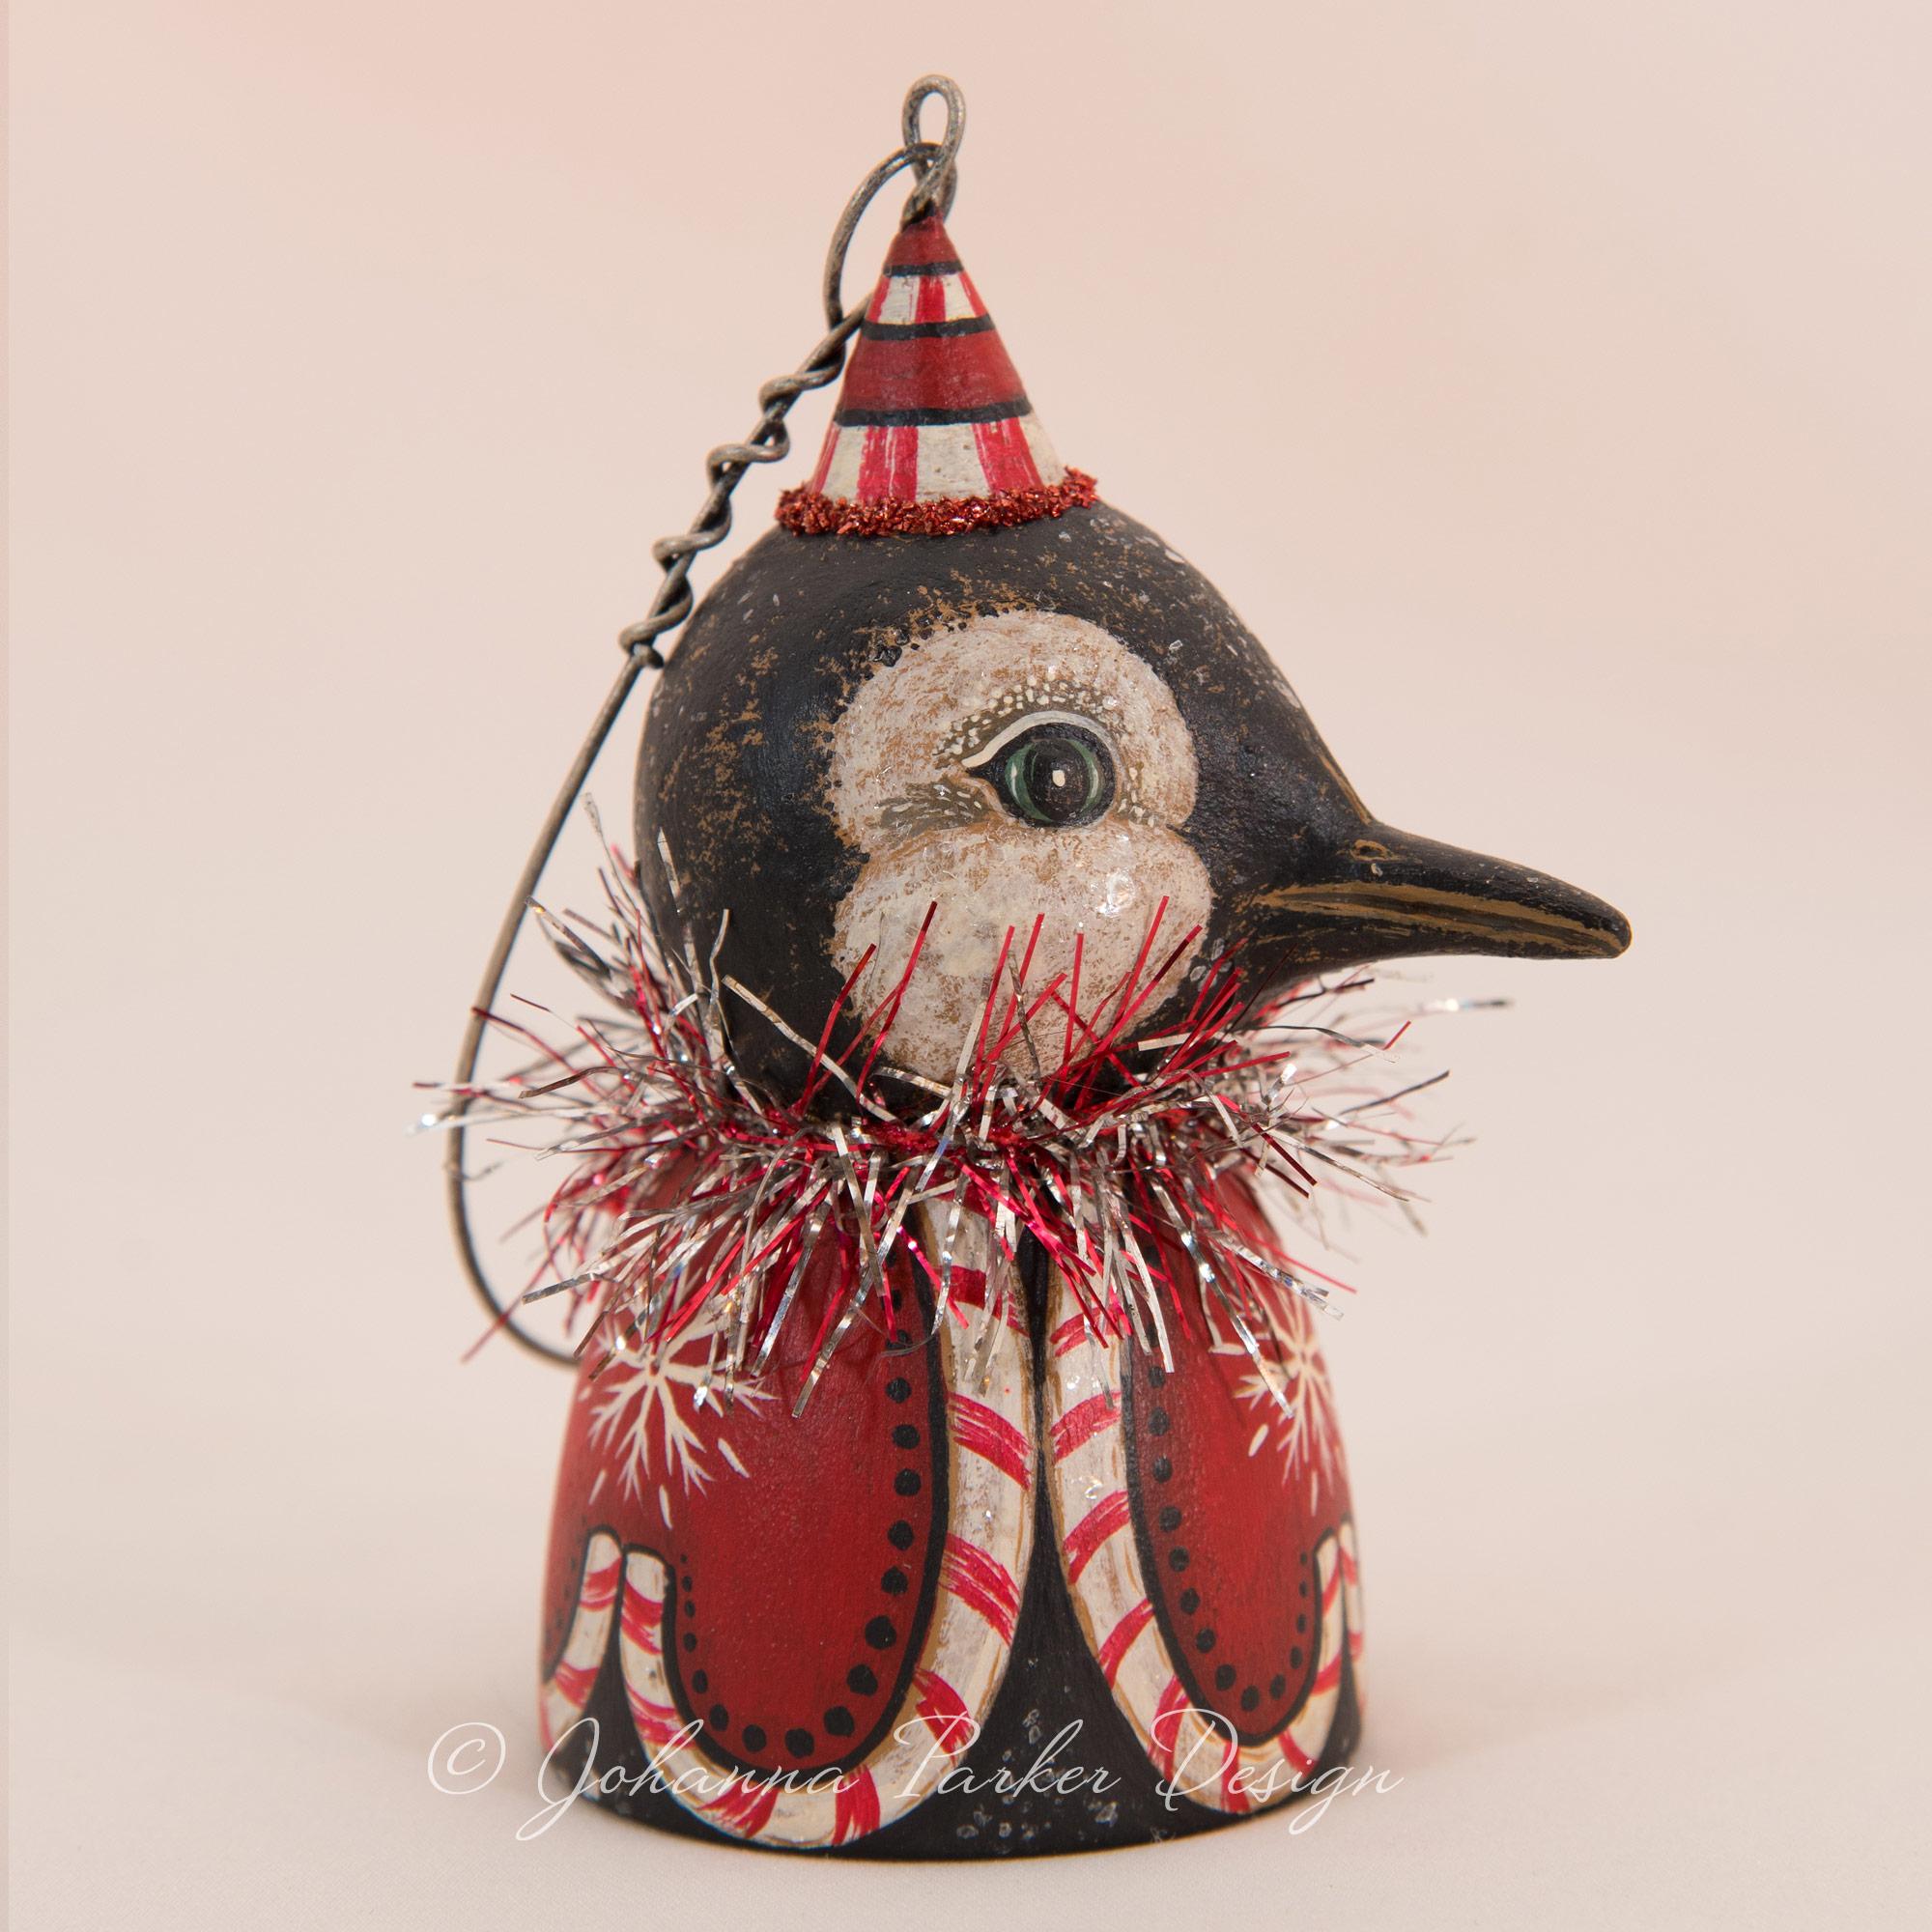 Johanna-Parker-Penguin-Ornament-Bell-2.jpg